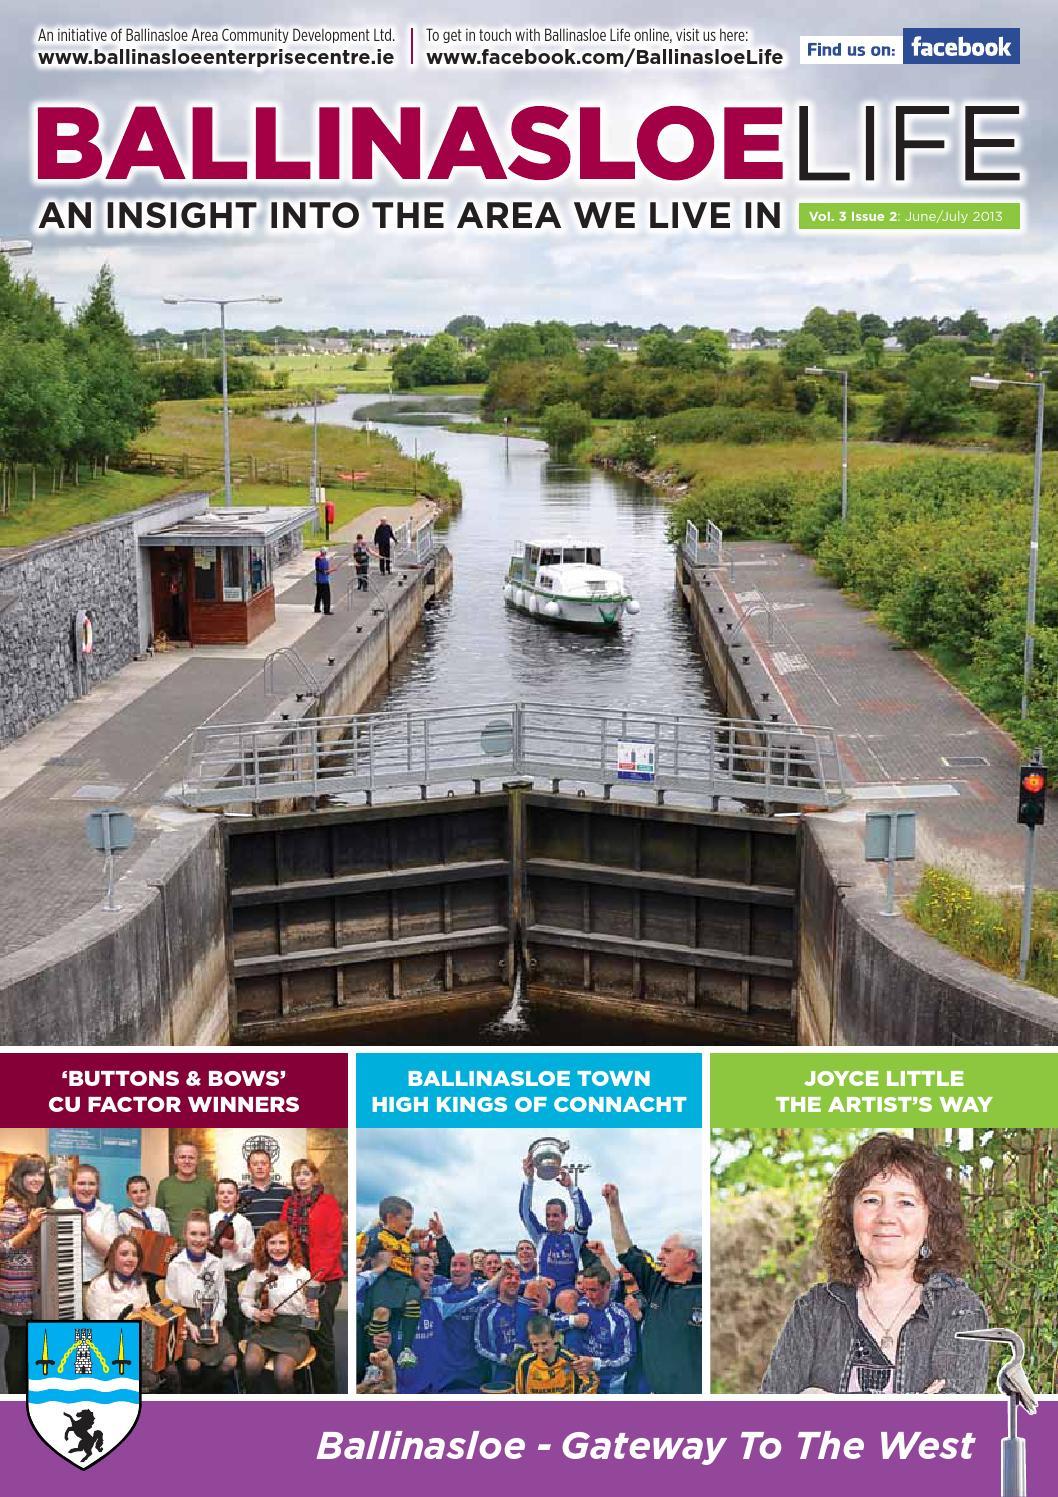 Ballinasloe Life Vol. 2 Issue 6 Feb/March 2013 by Ballinasloe